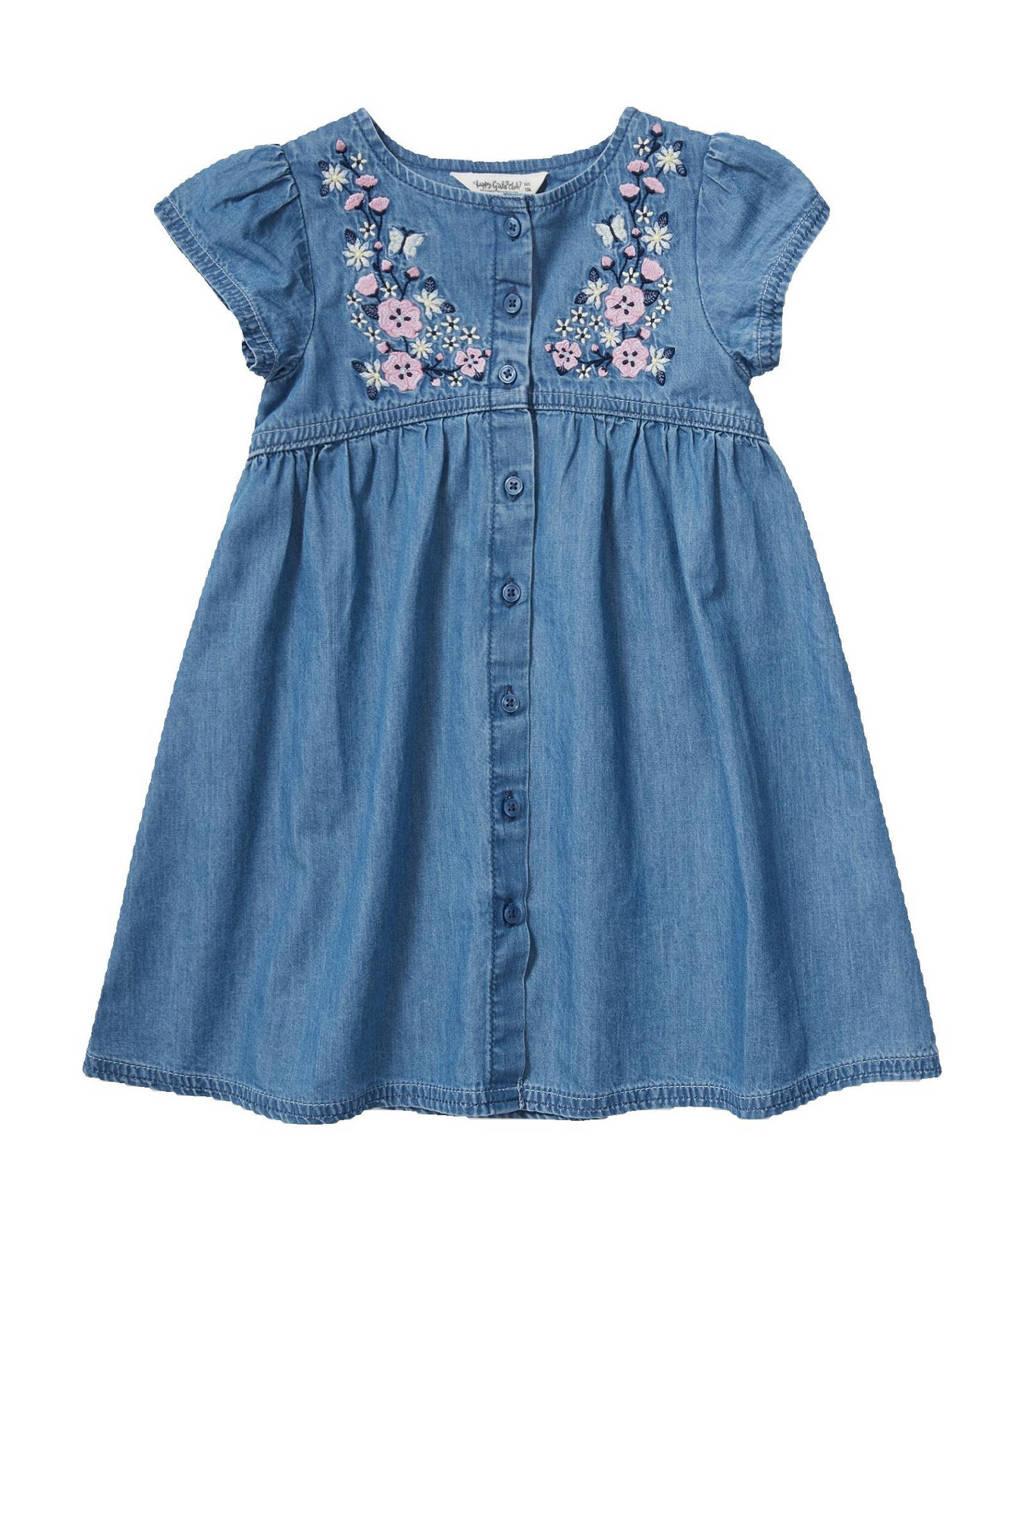 C&A Happy girls Club spijkerjurk, Blauw